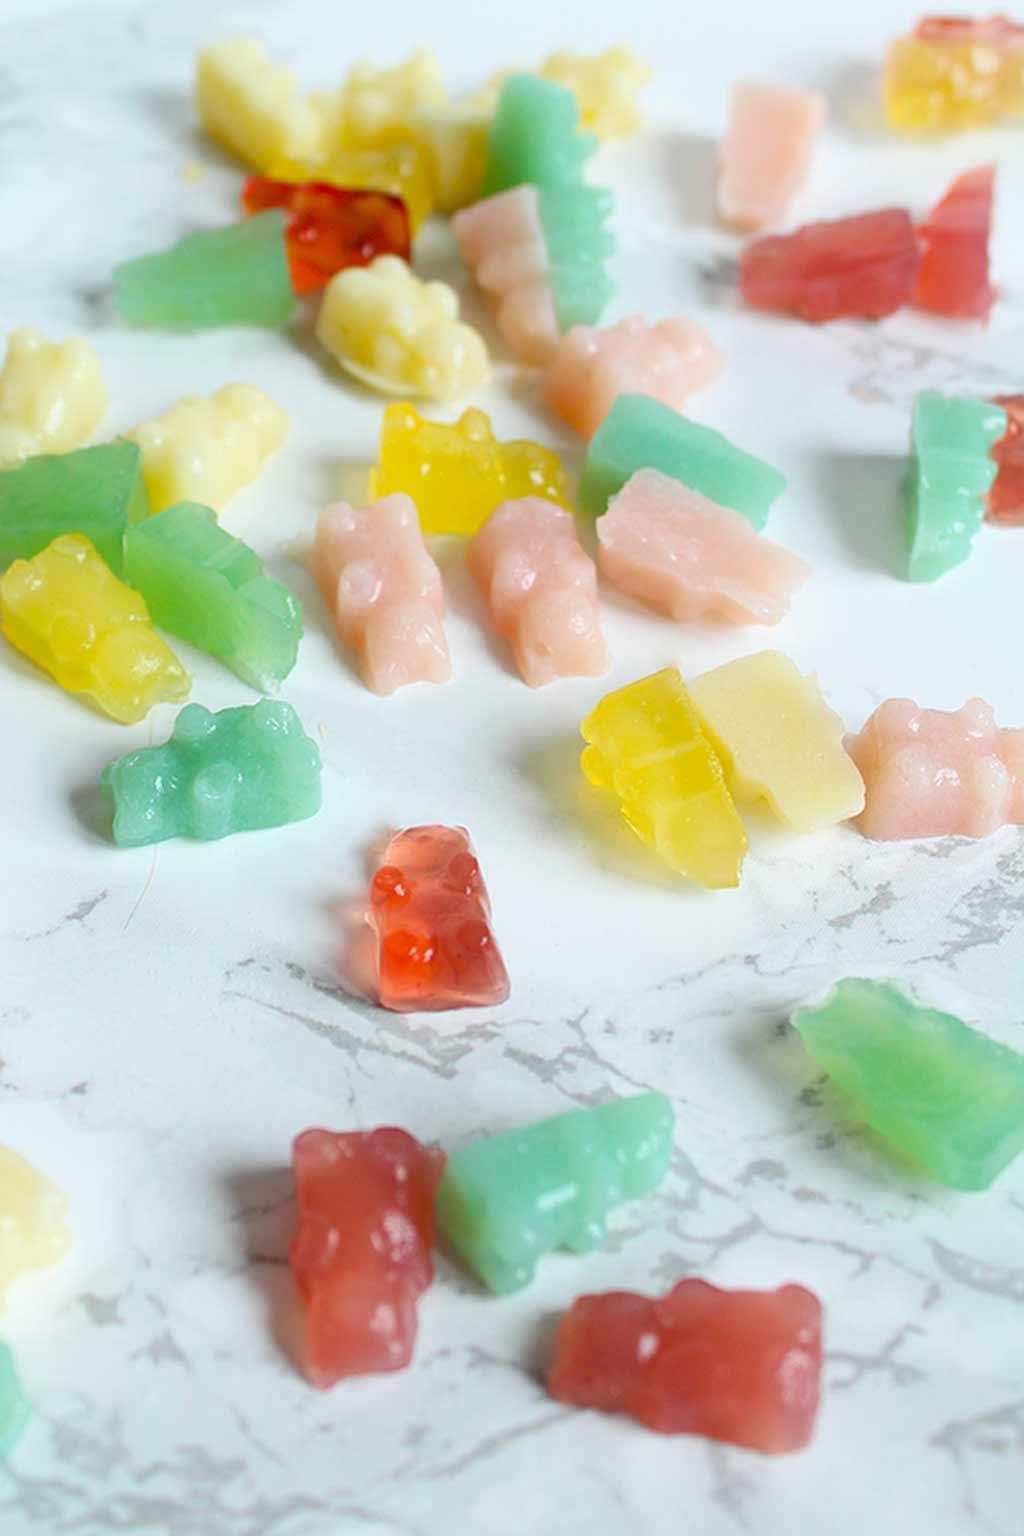 vegan gummy bears scattered on worktop